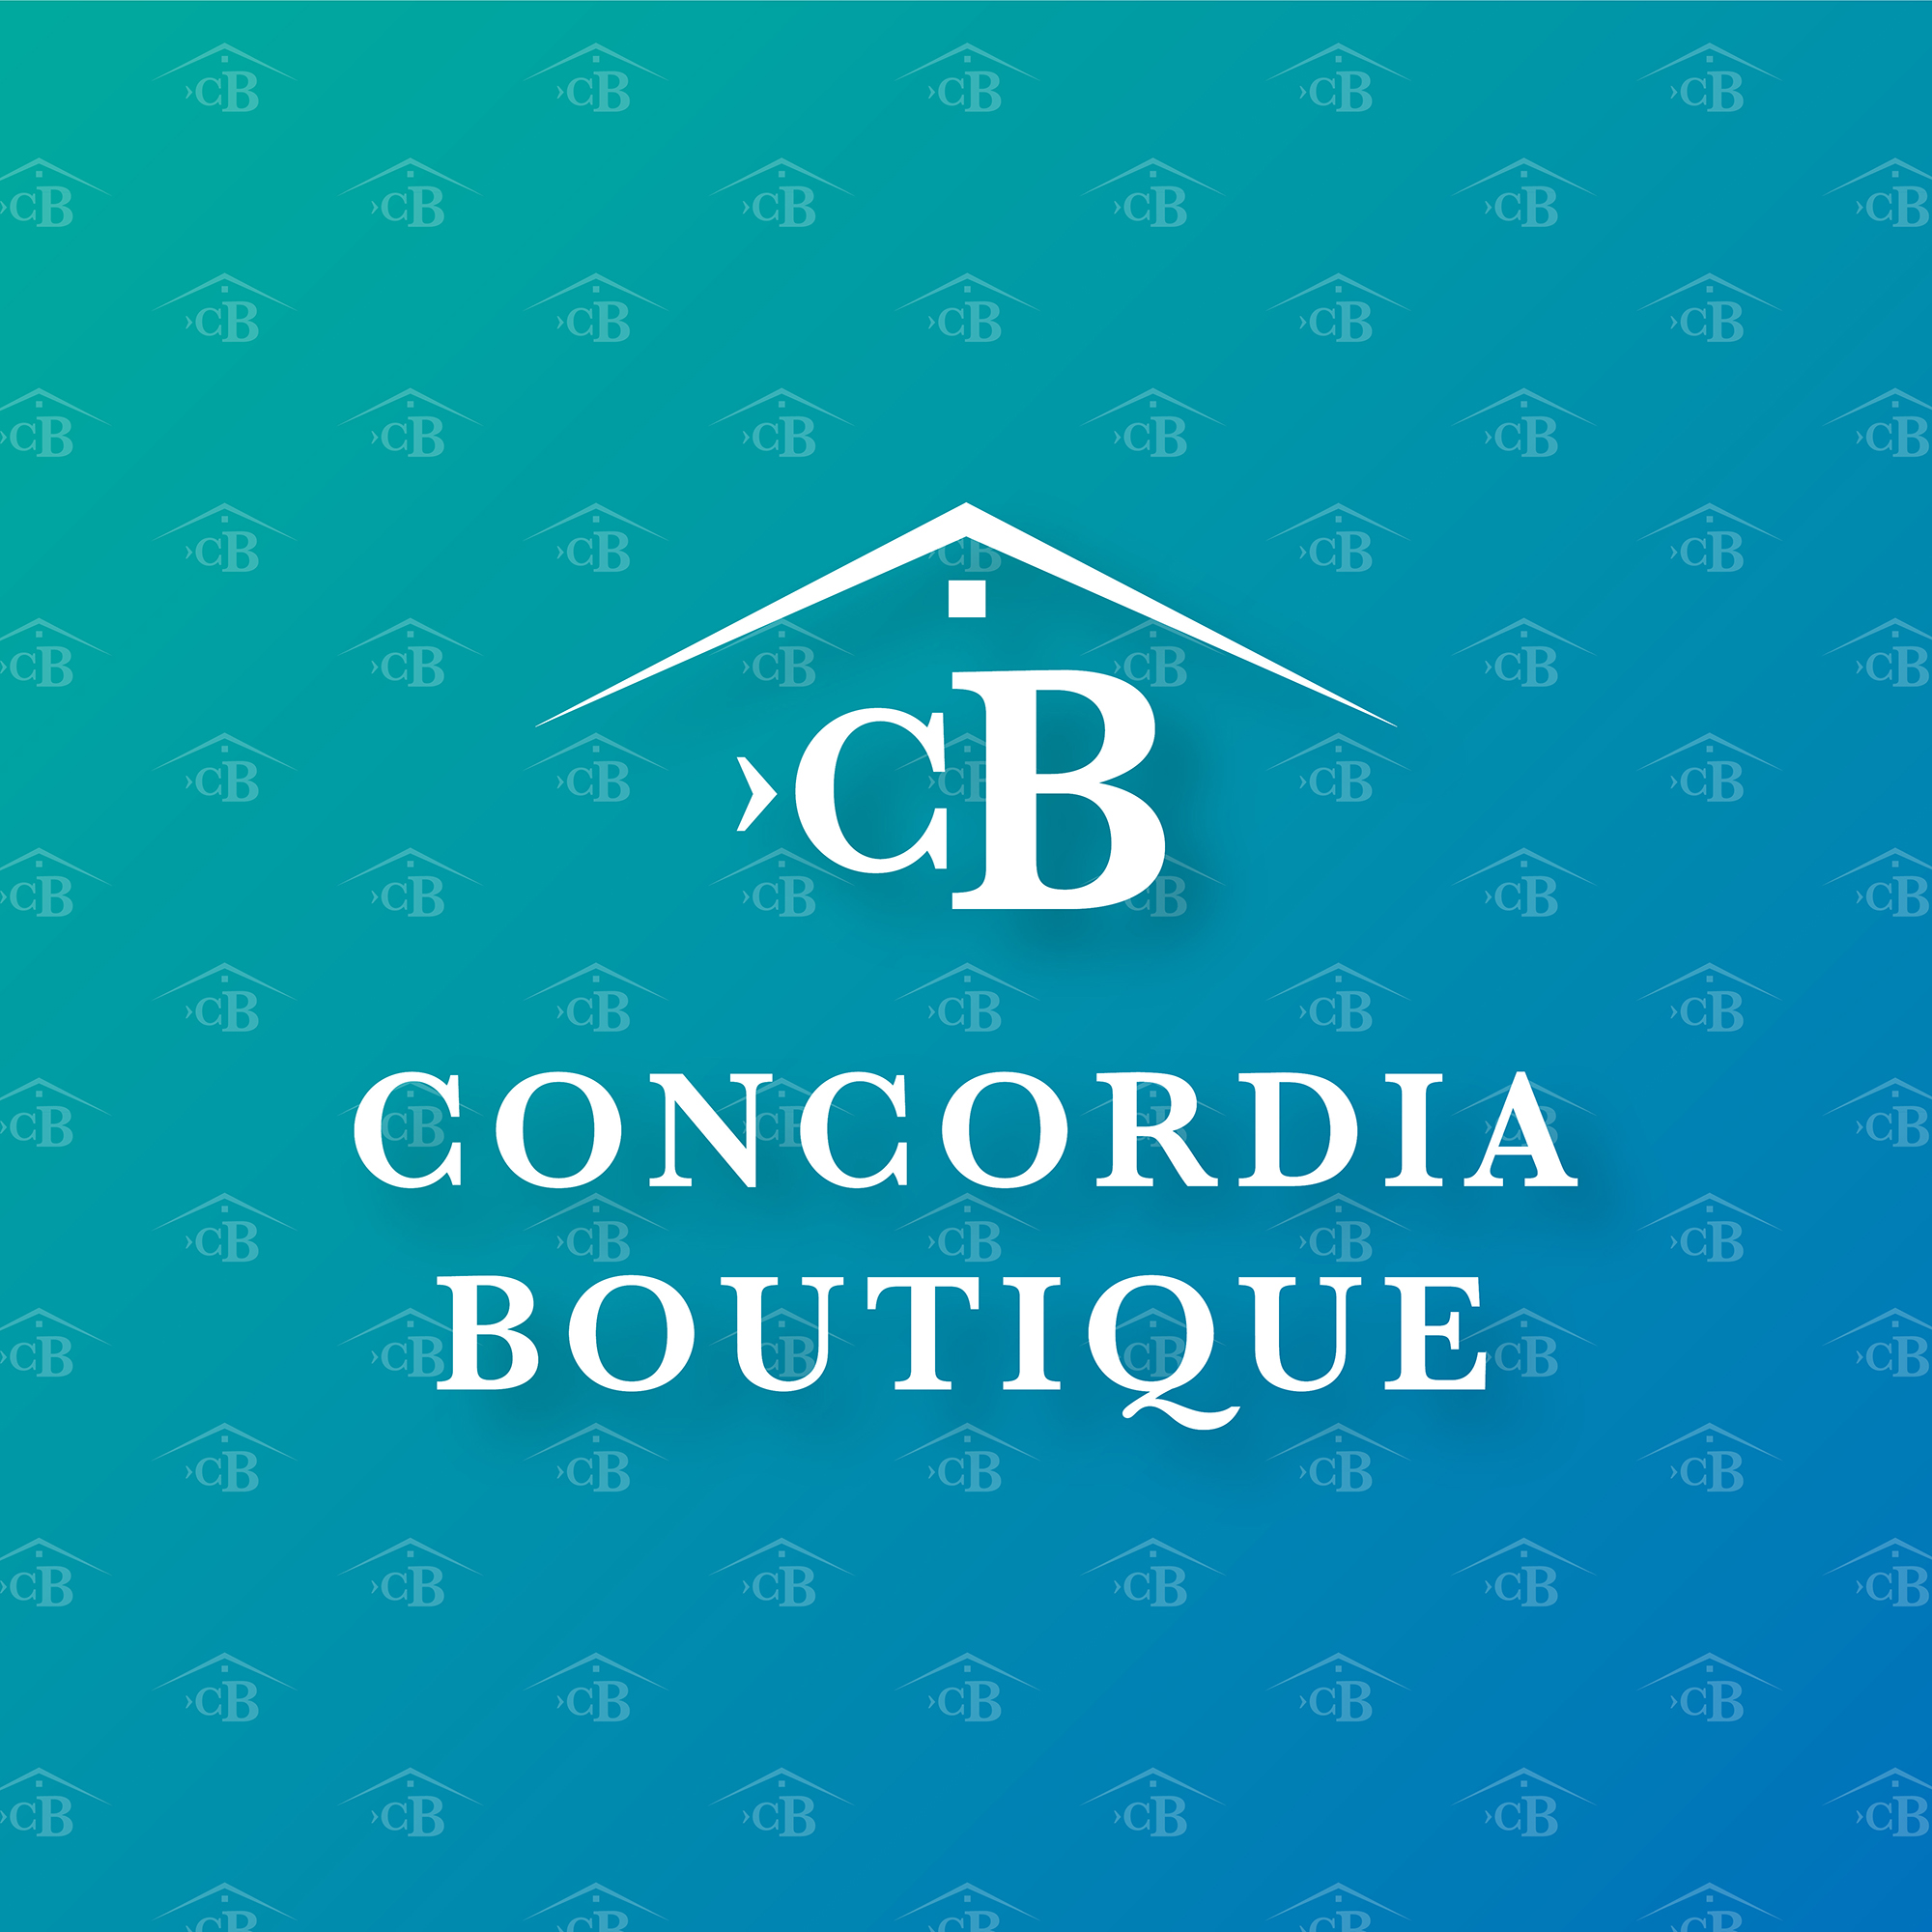 Concordia_Boutique-01.jpg